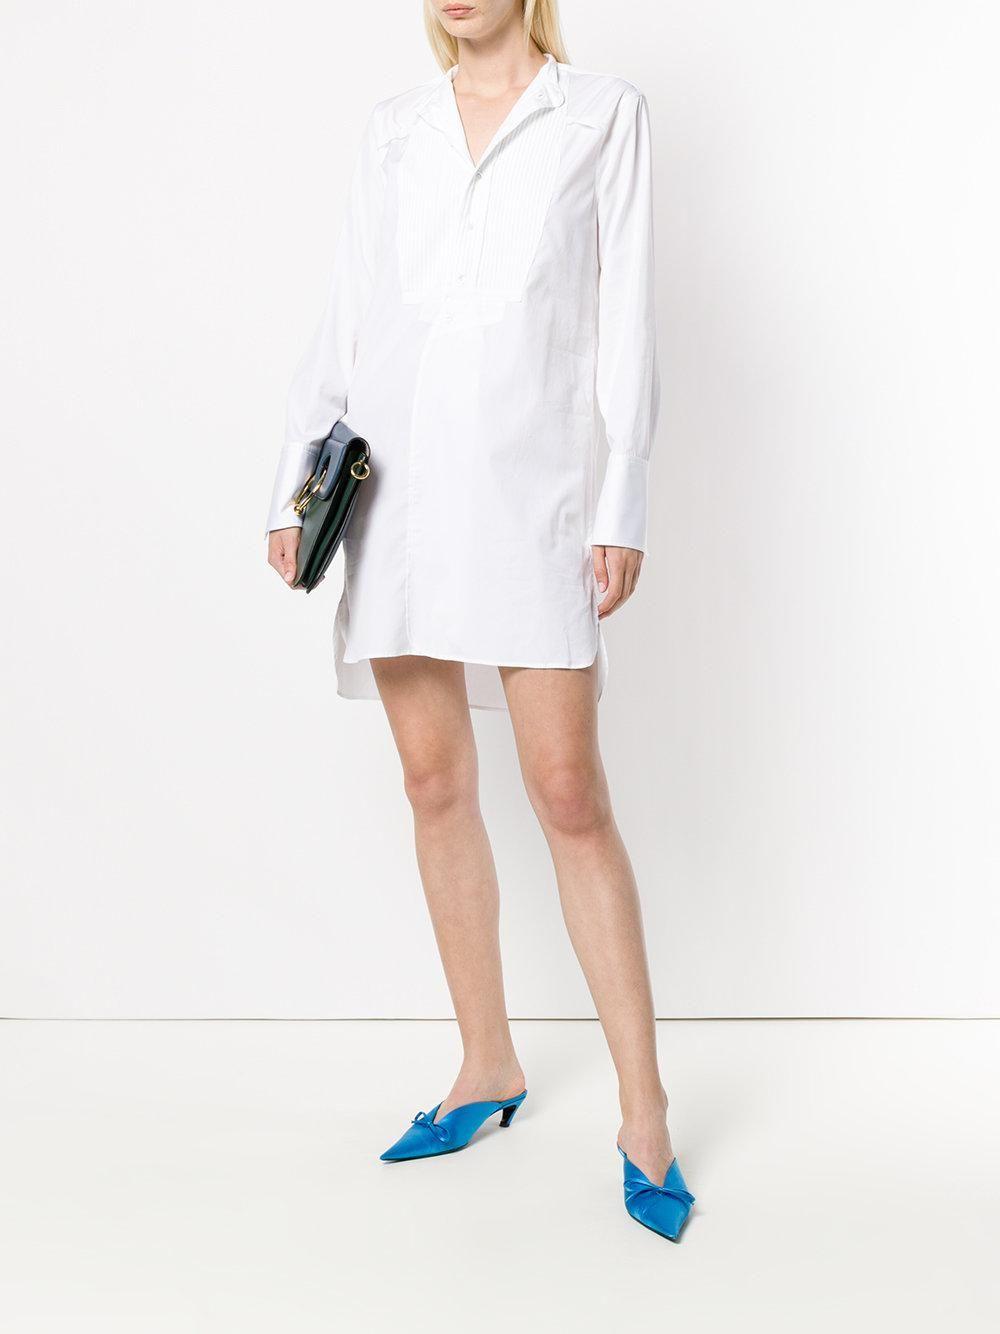 Victoria Victoria Beckham White Victoria Victoria Beckham Collarless Shirt White Dress [ 1334 x 1000 Pixel ]